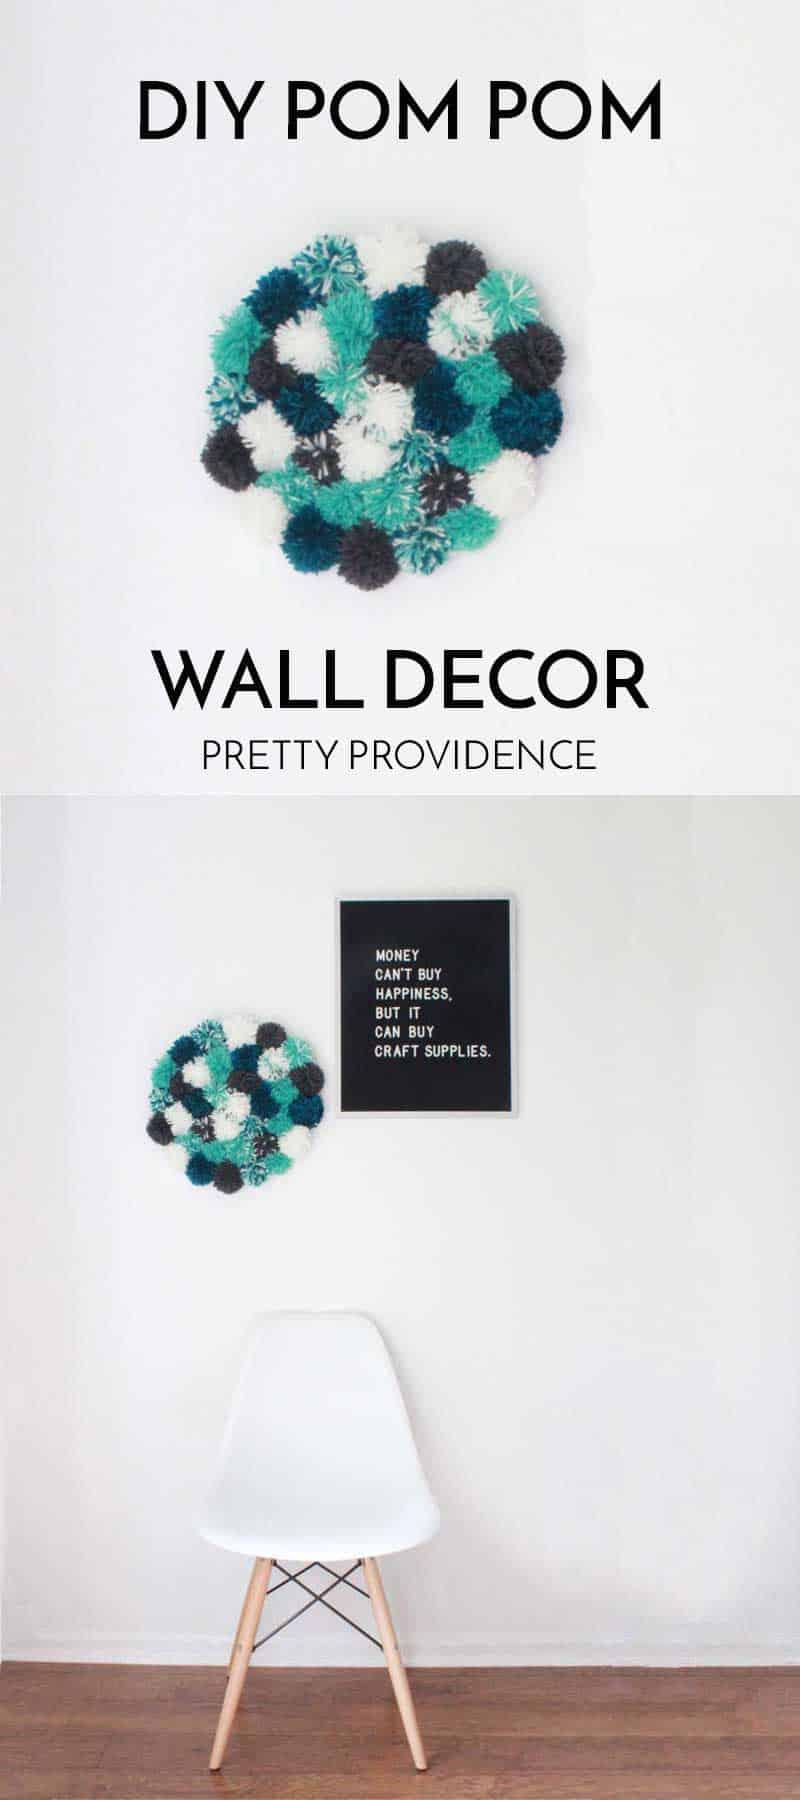 DIY Pom Pom Wall Decor! SUPER FUN right?!? I love this!